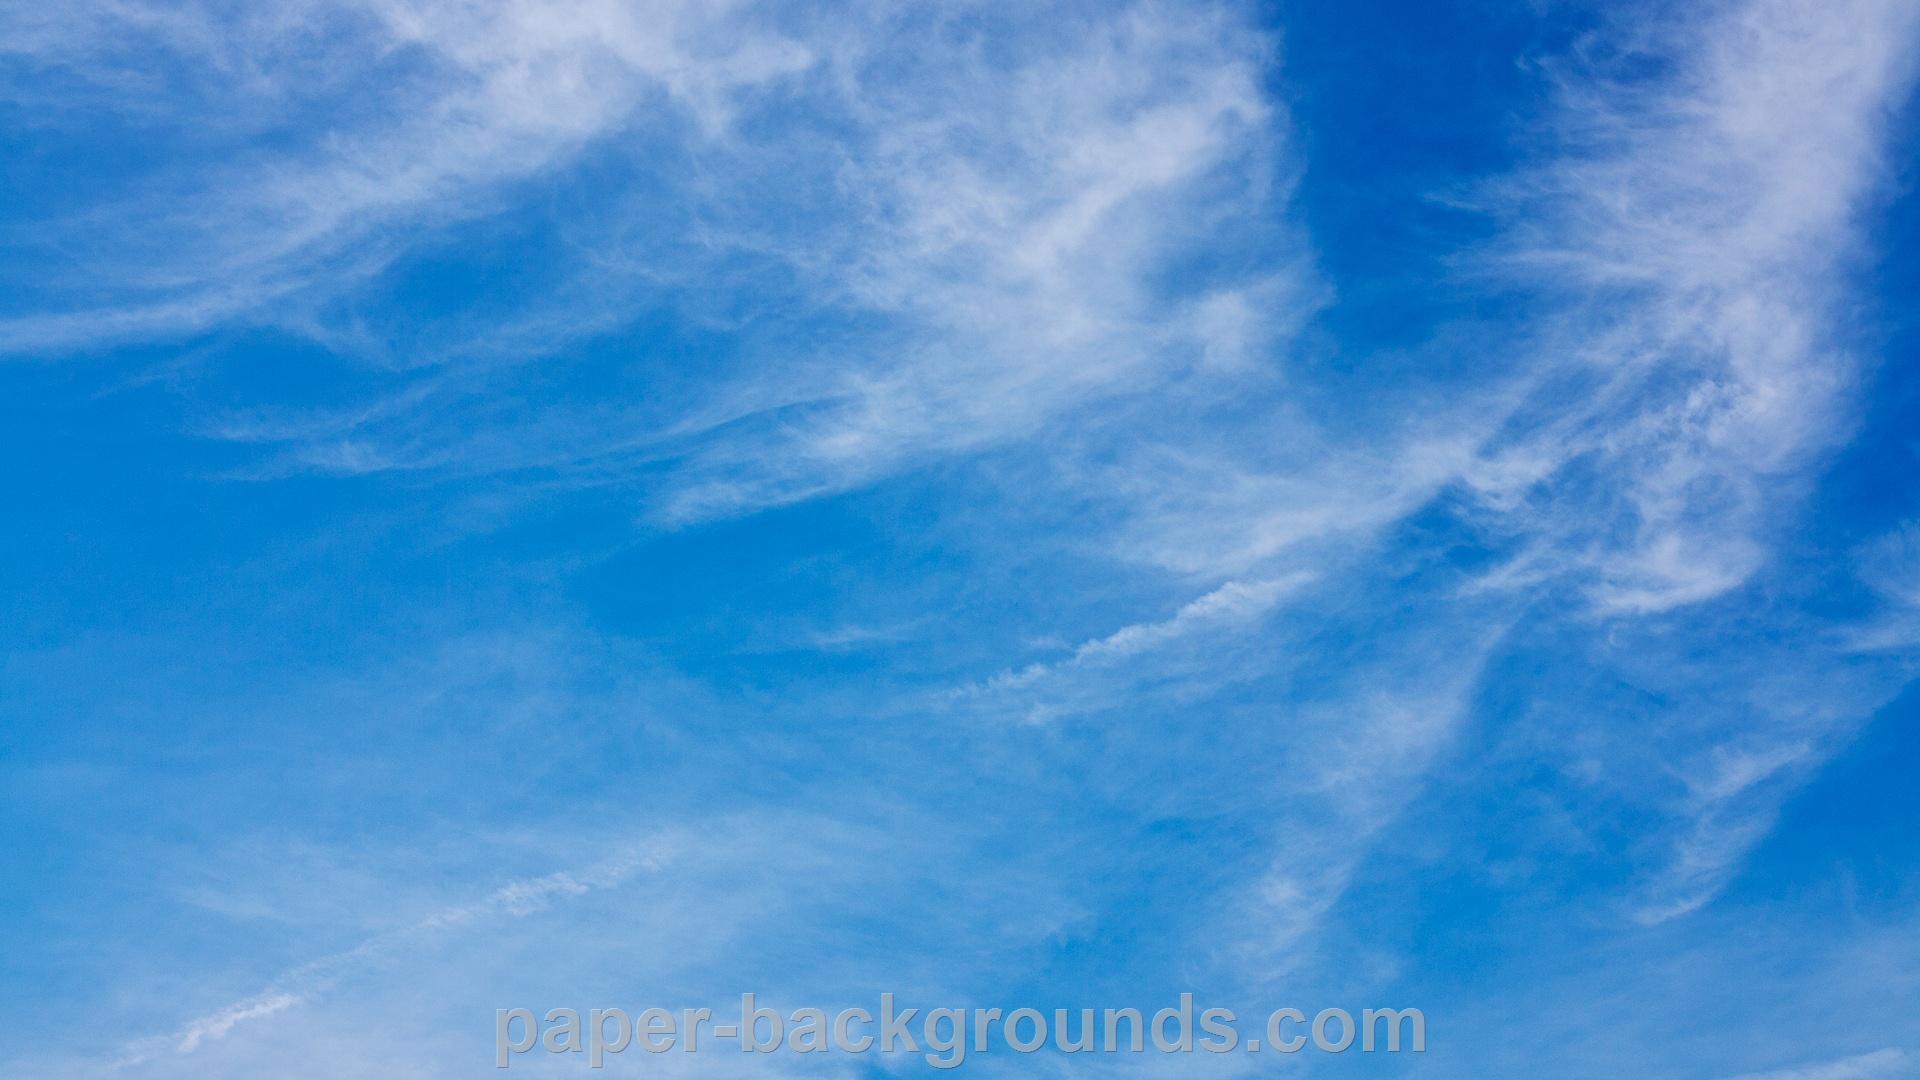 Sky Blue Background wallpaper   674760 1920x1080